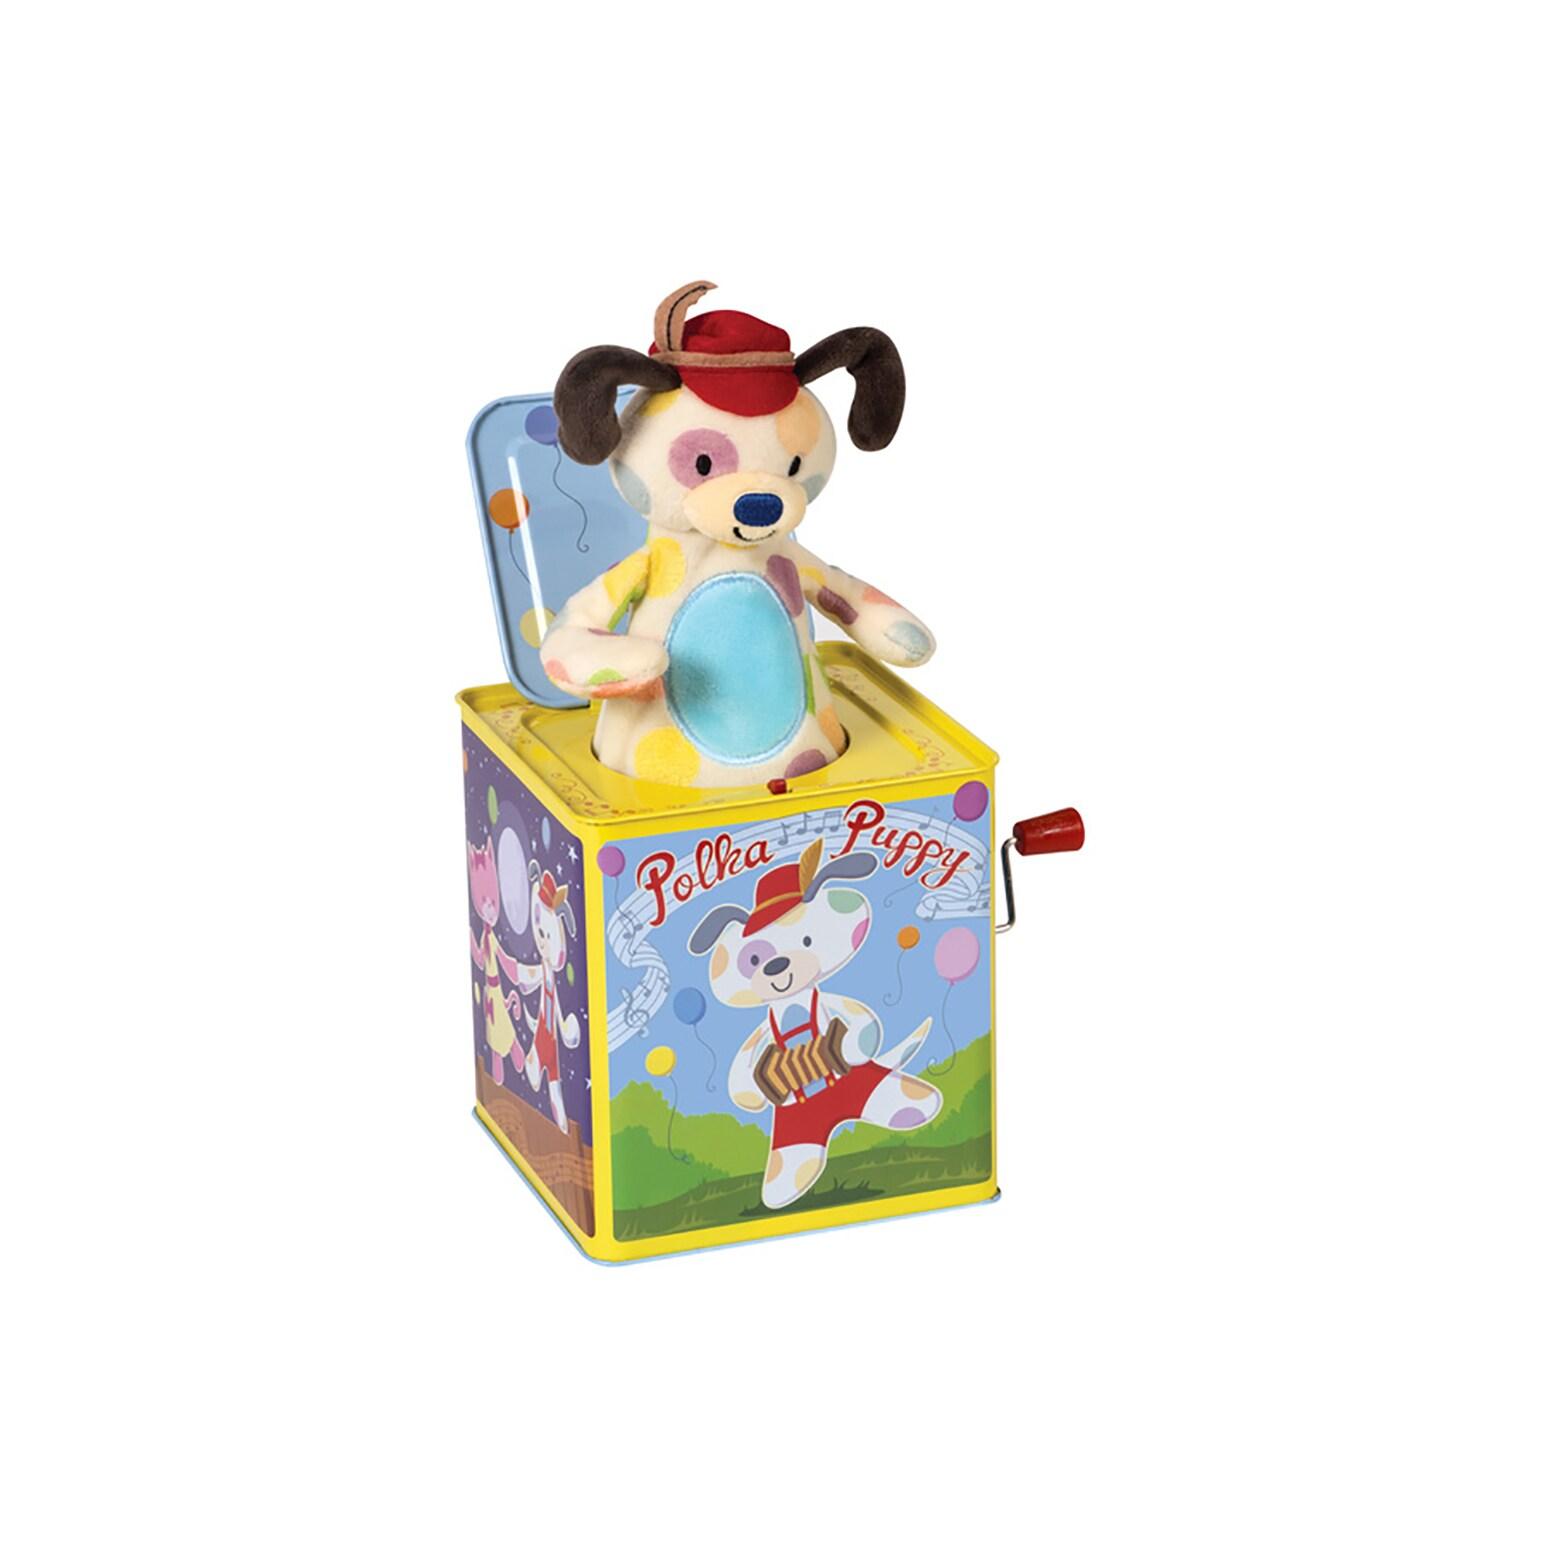 Schylling Polka Puppy Jack In Box (G019649233793)